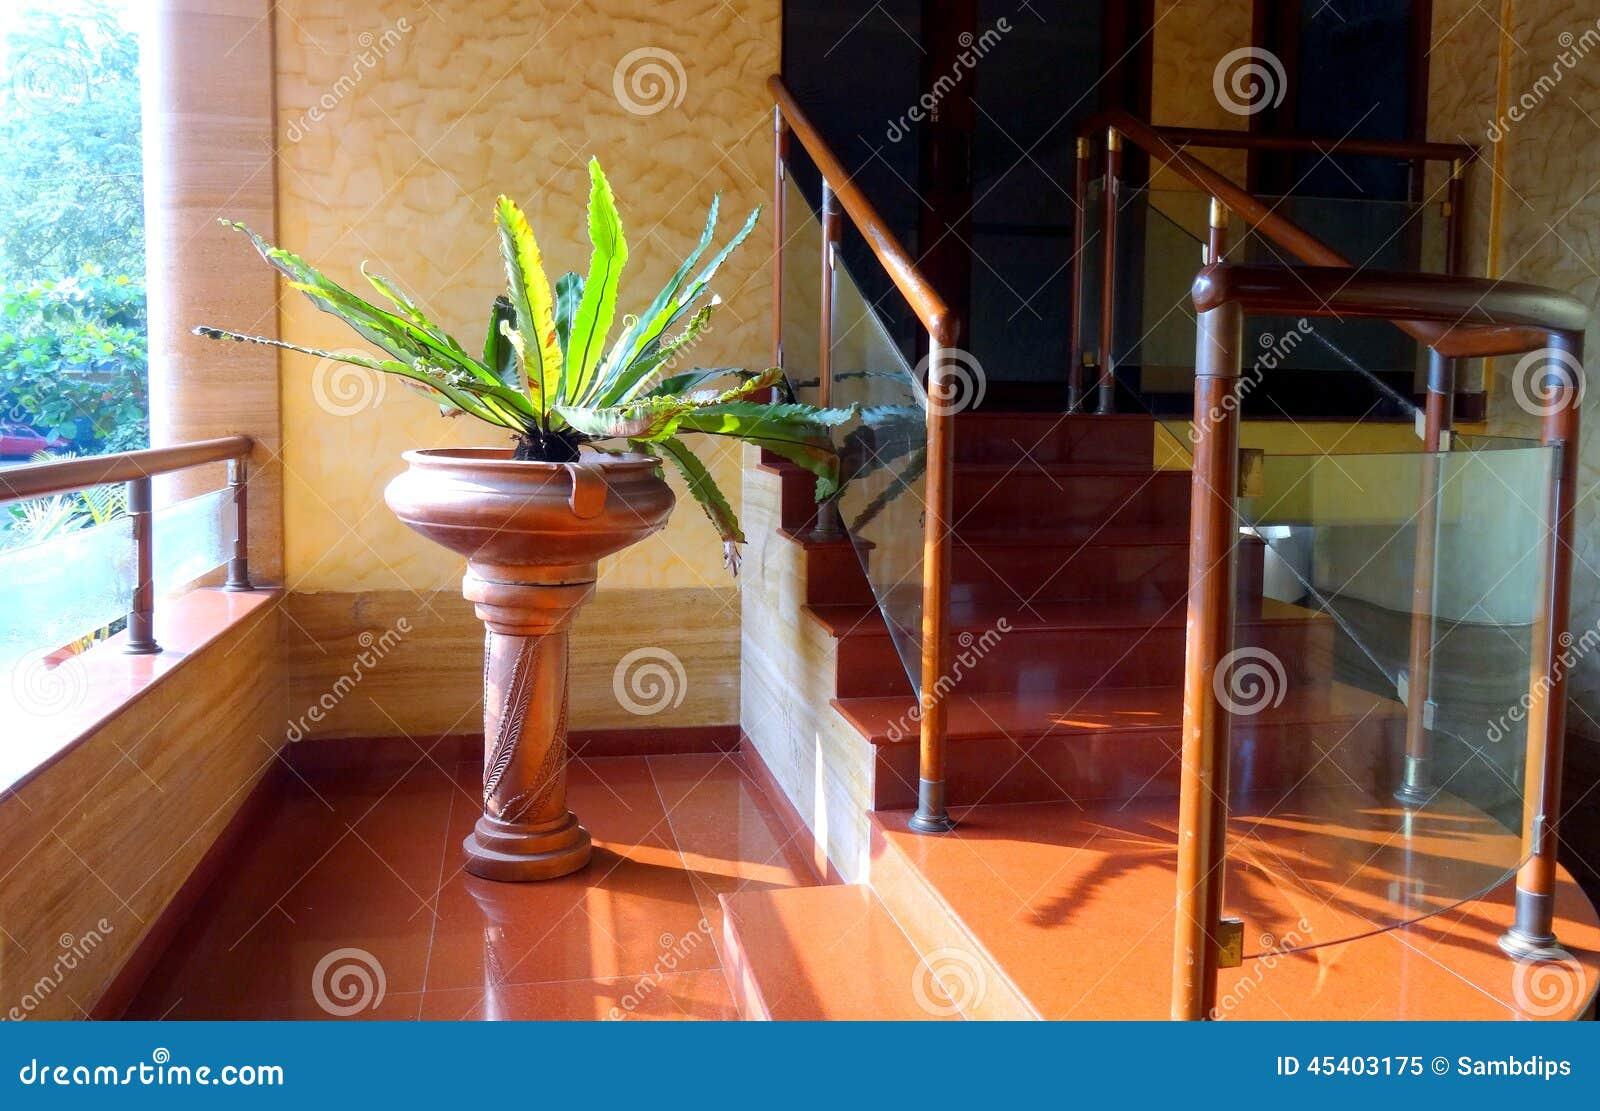 Inre blomkruka på en sockel